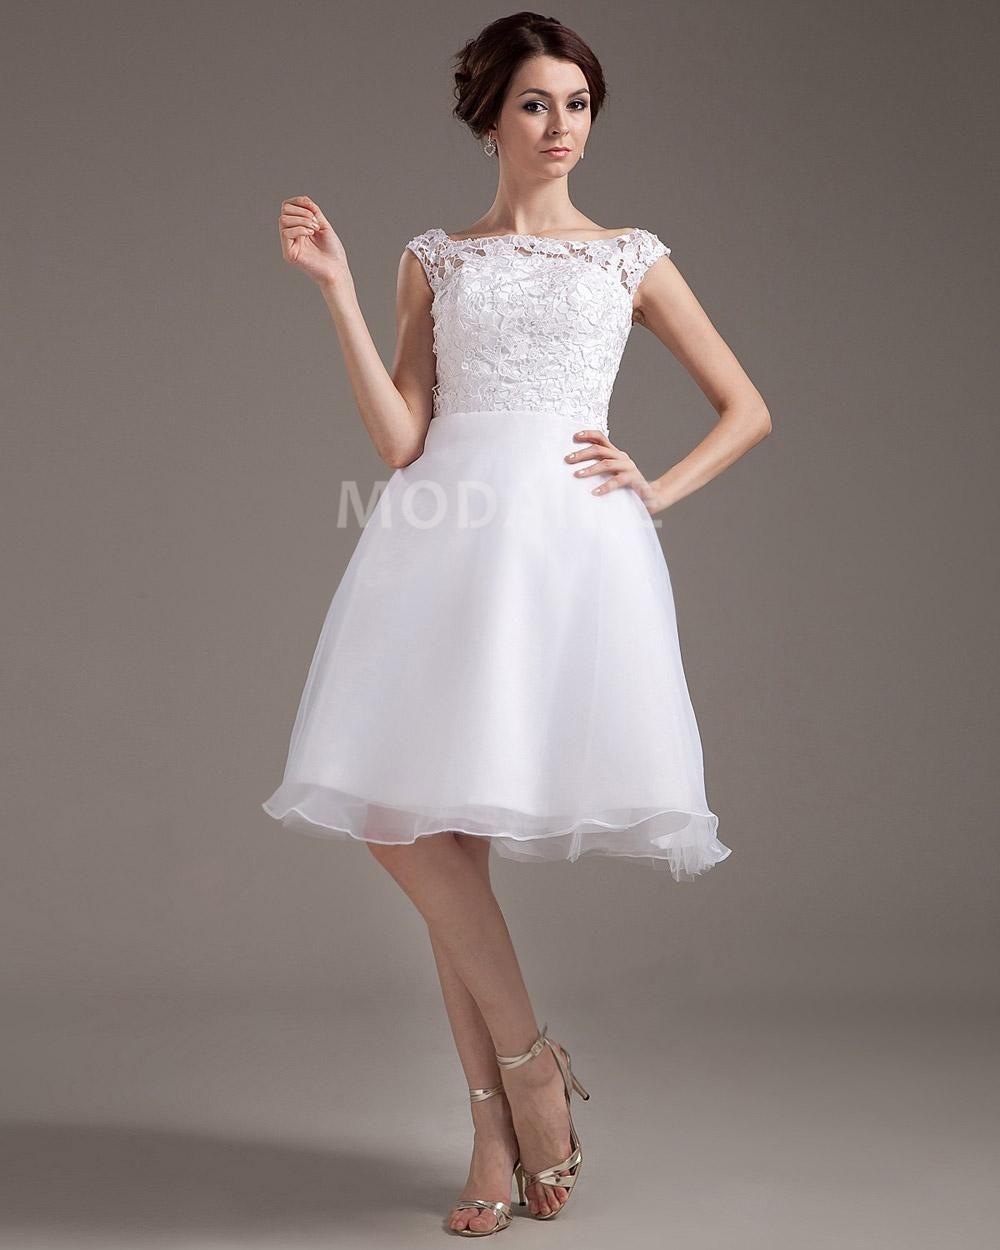 Robe blanche pour un mariage civil